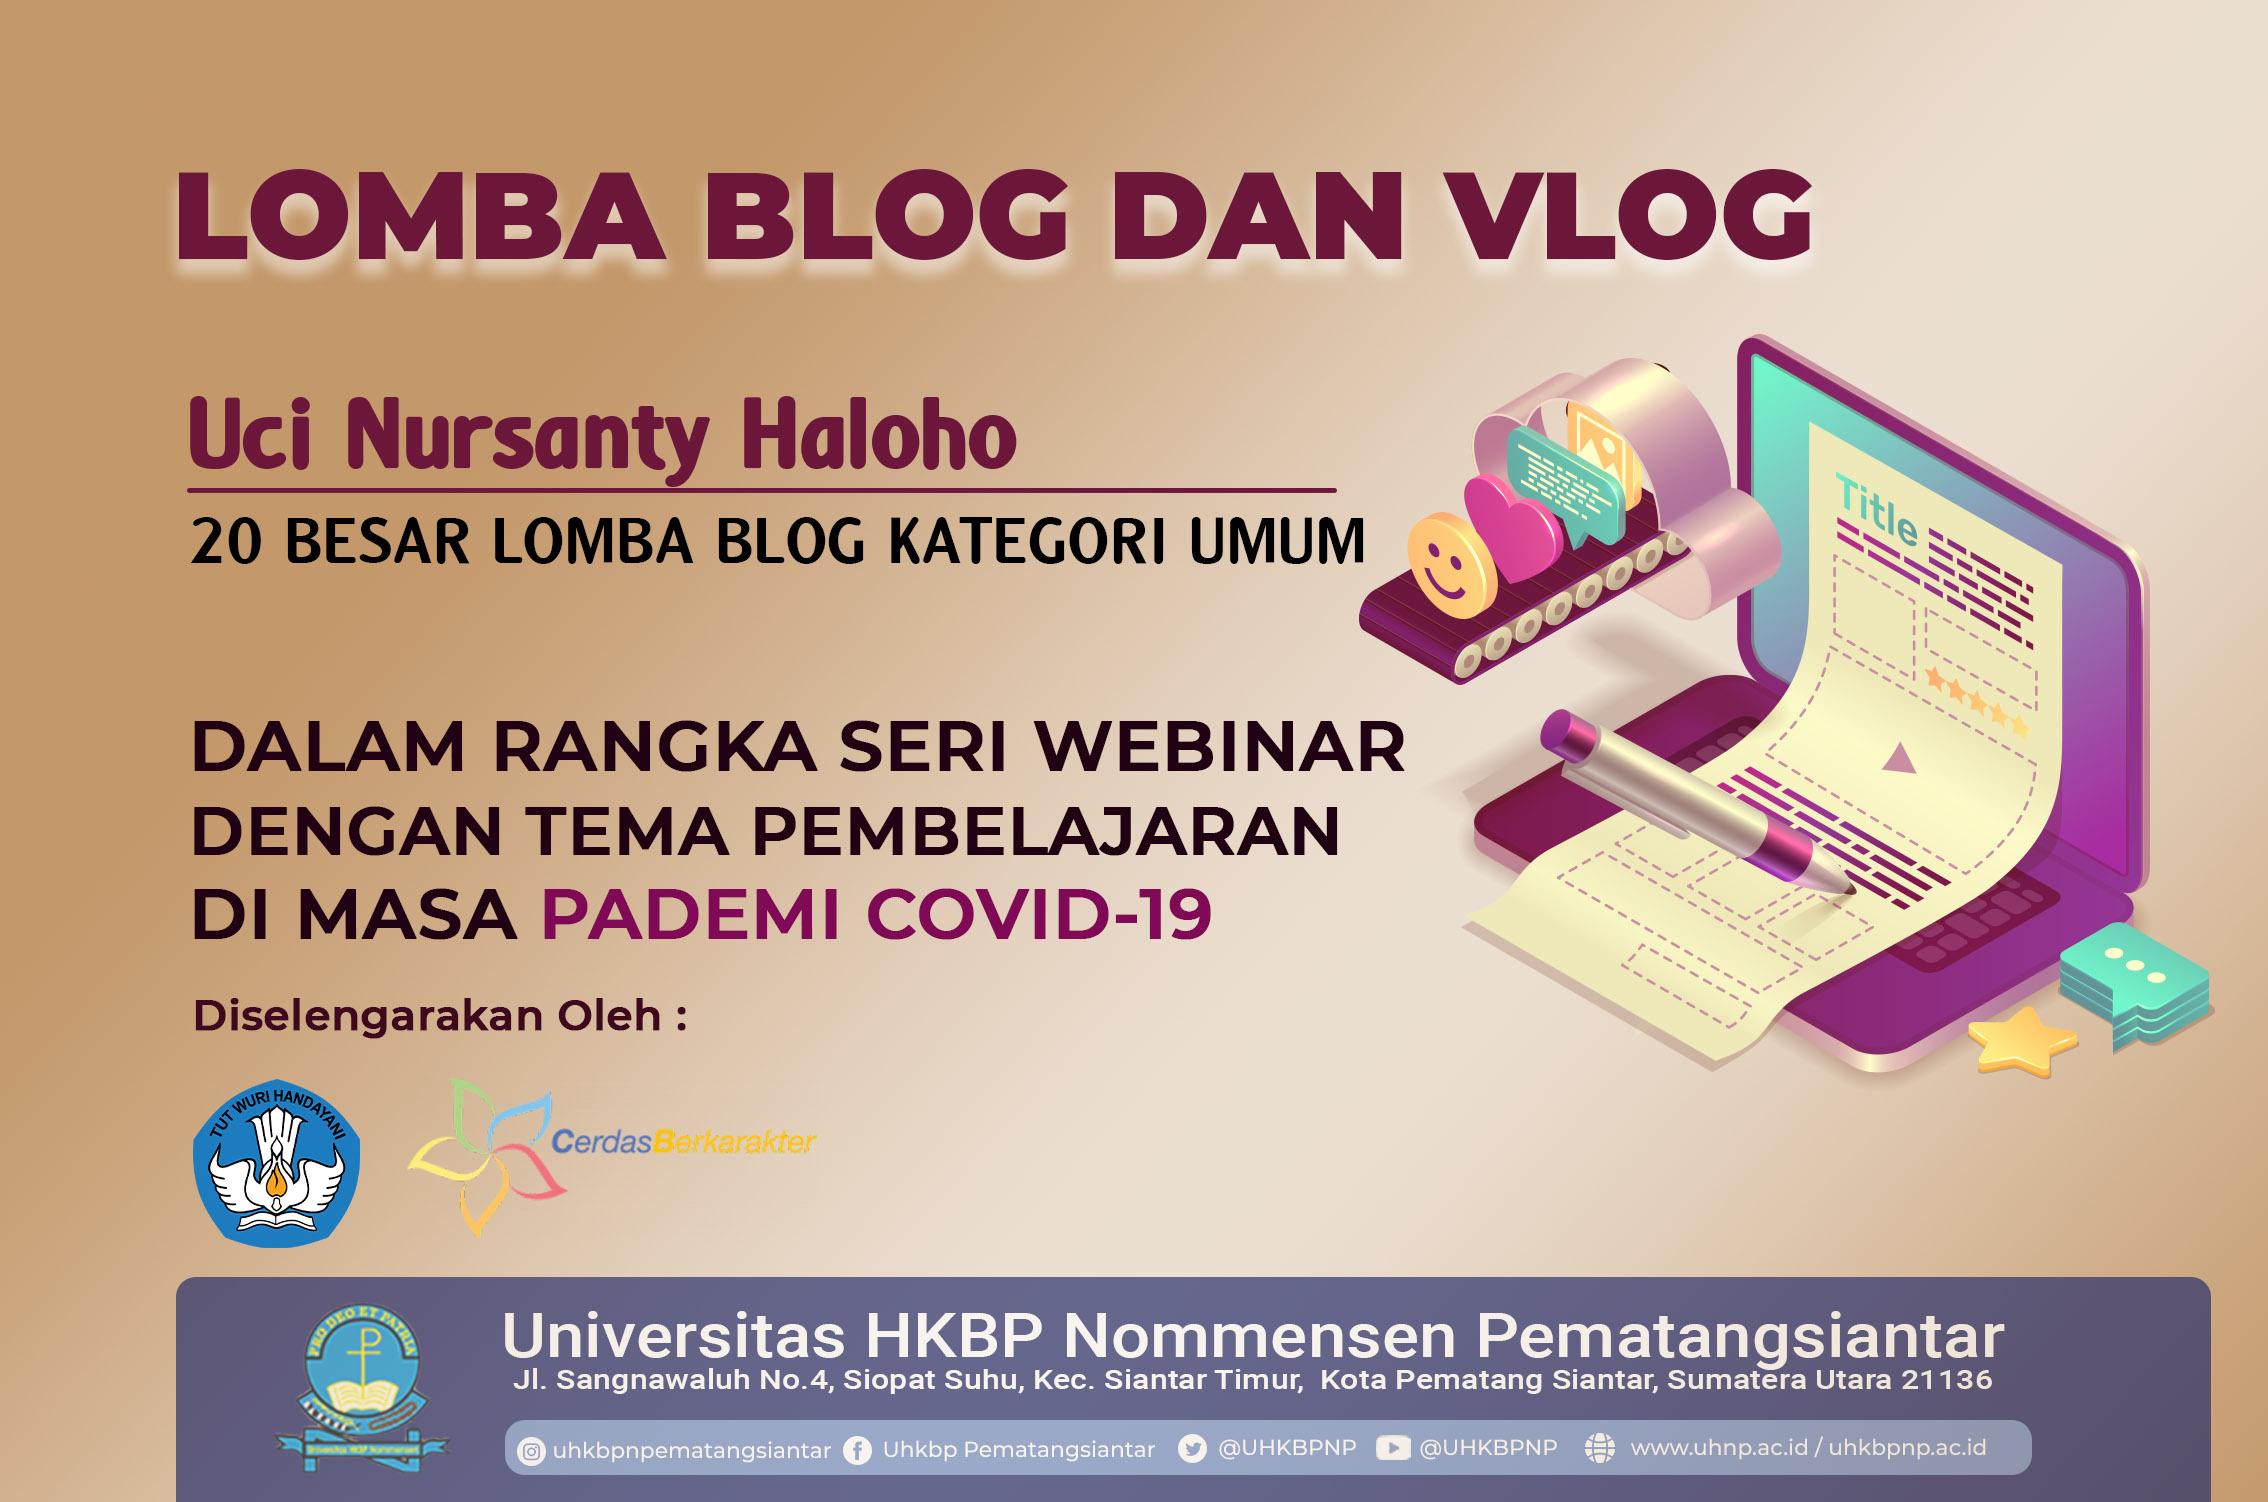 Lomba Blog Kategori Umum Dalam Acara Lomba Blog dan Vlog Dalam Rangka Seri Webinar Dengan Tema Pembelajaran Di Masa Pandemi Covid-19